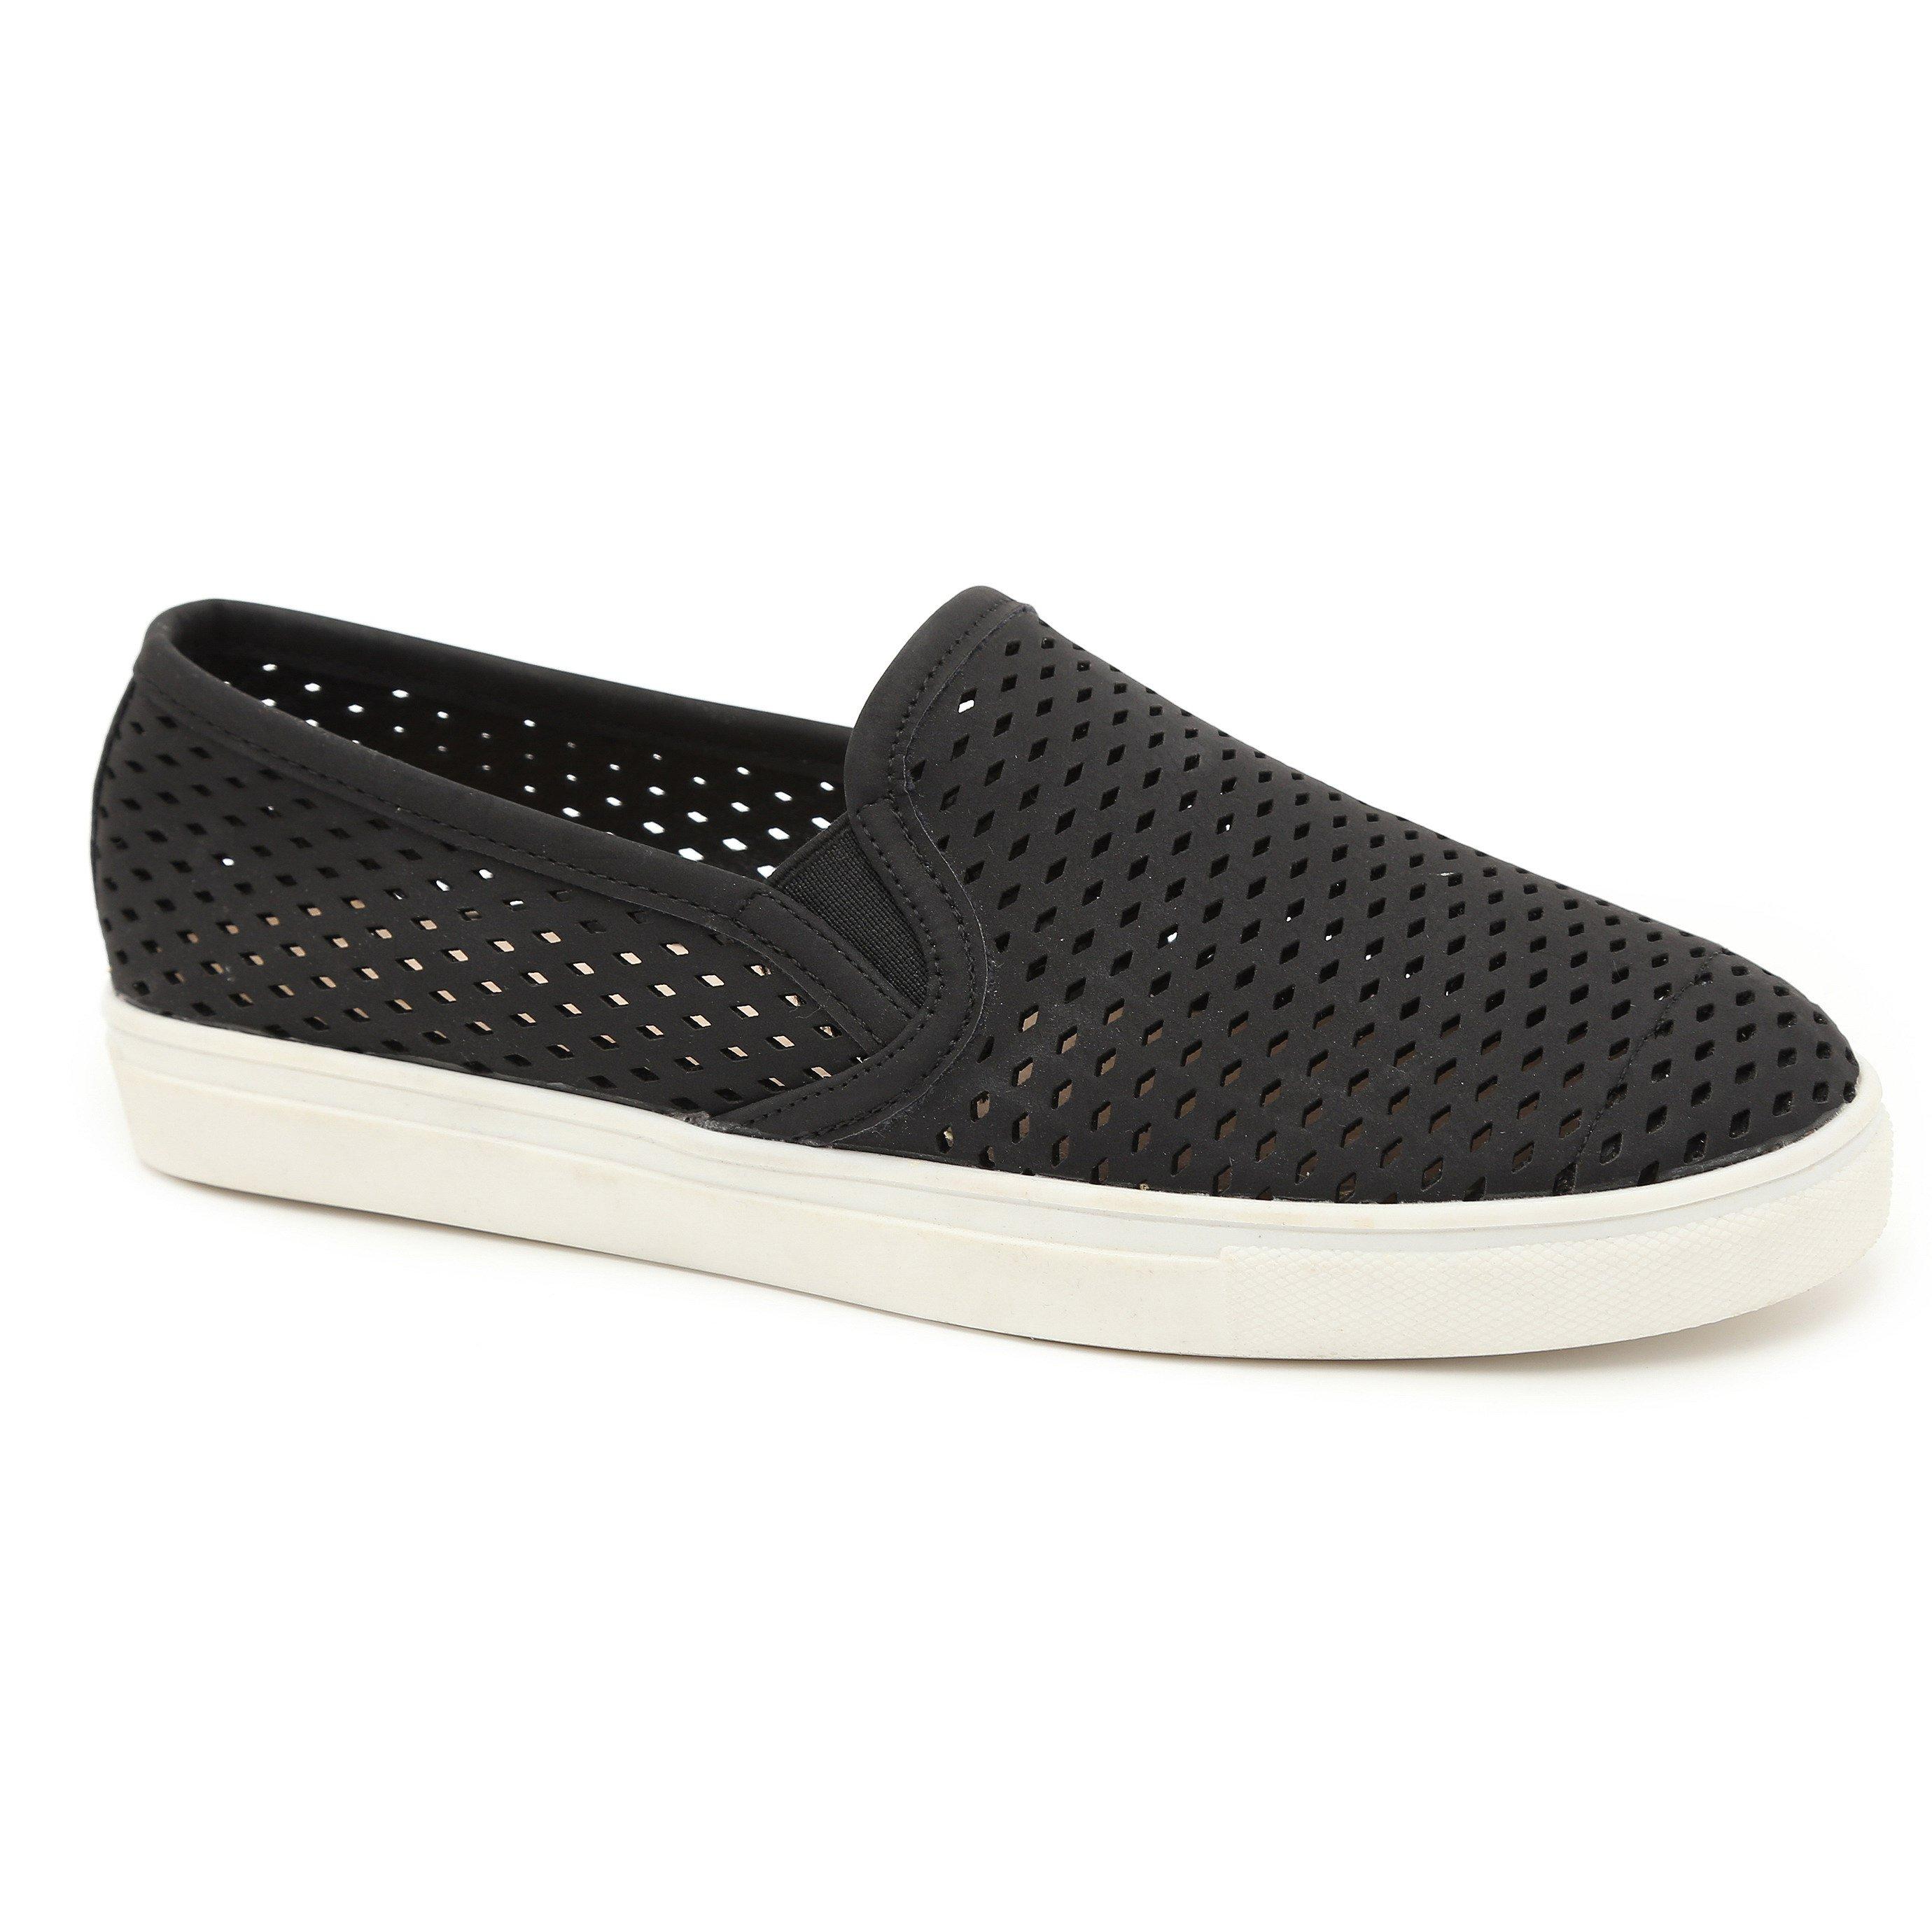 Seventy Nine - נעלי סליפ-און בצבע שחור בעיצוב חורי מעויינים